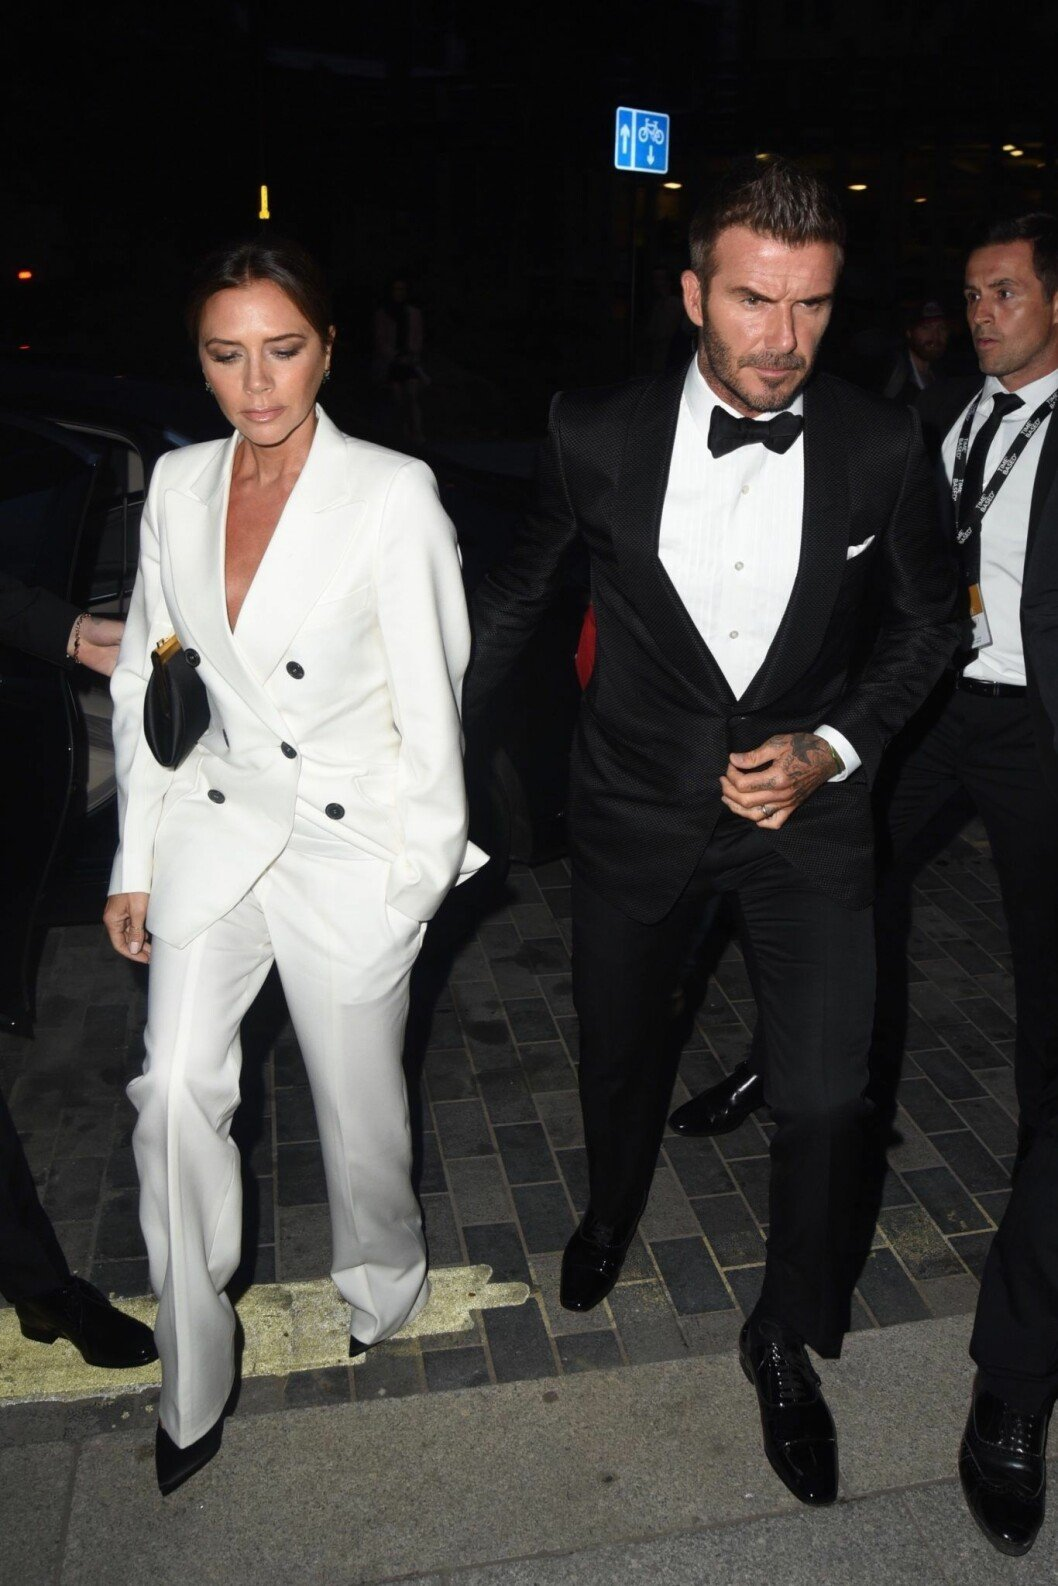 Victoria Beckham & David Beckham